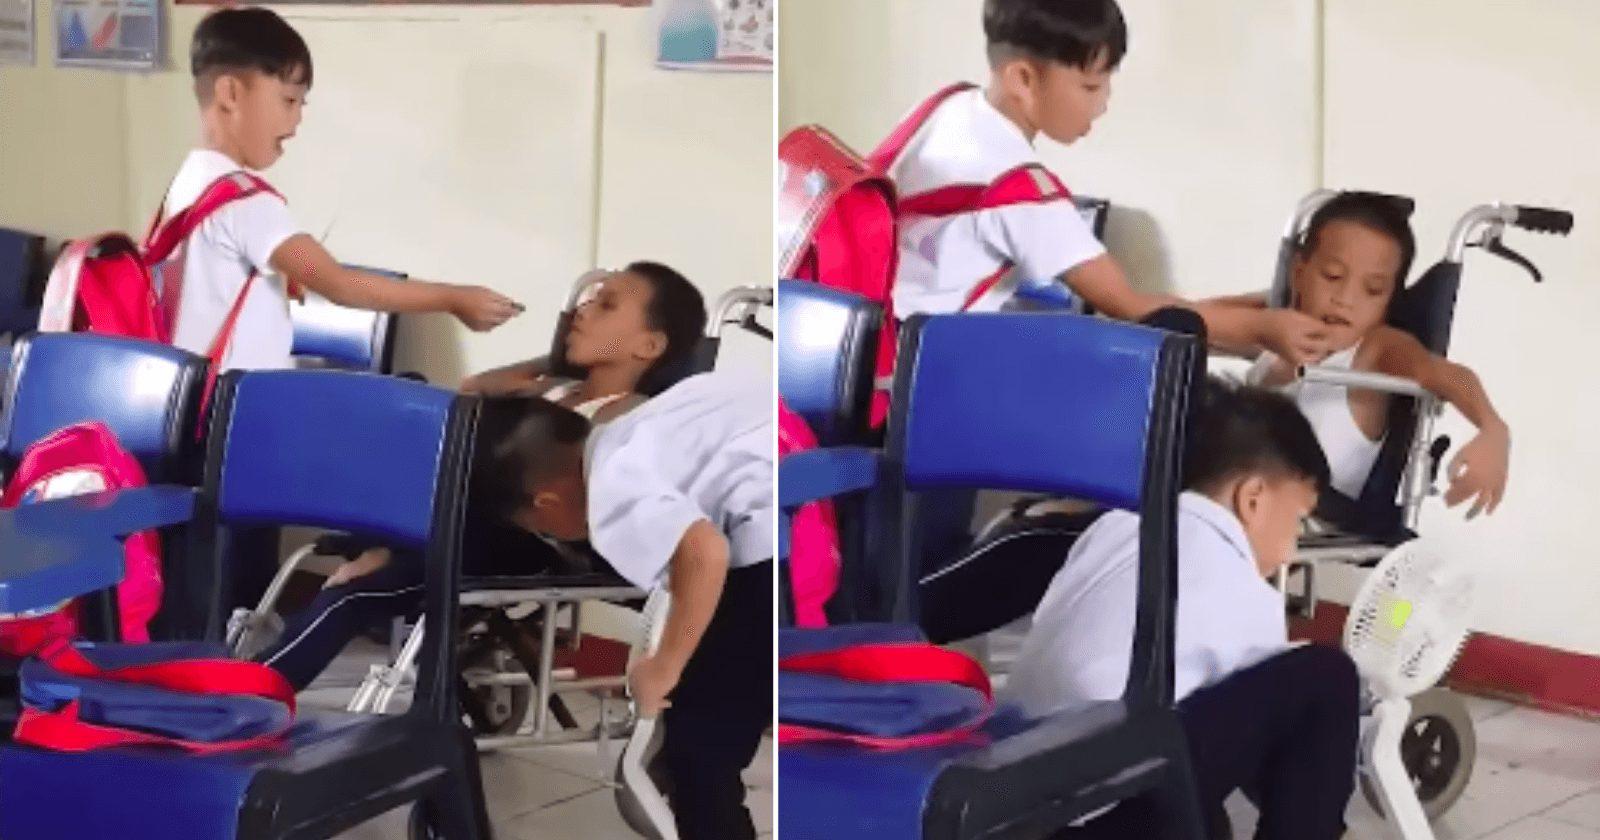 Meninos ajudam colega de classe com deficiência a lanchar